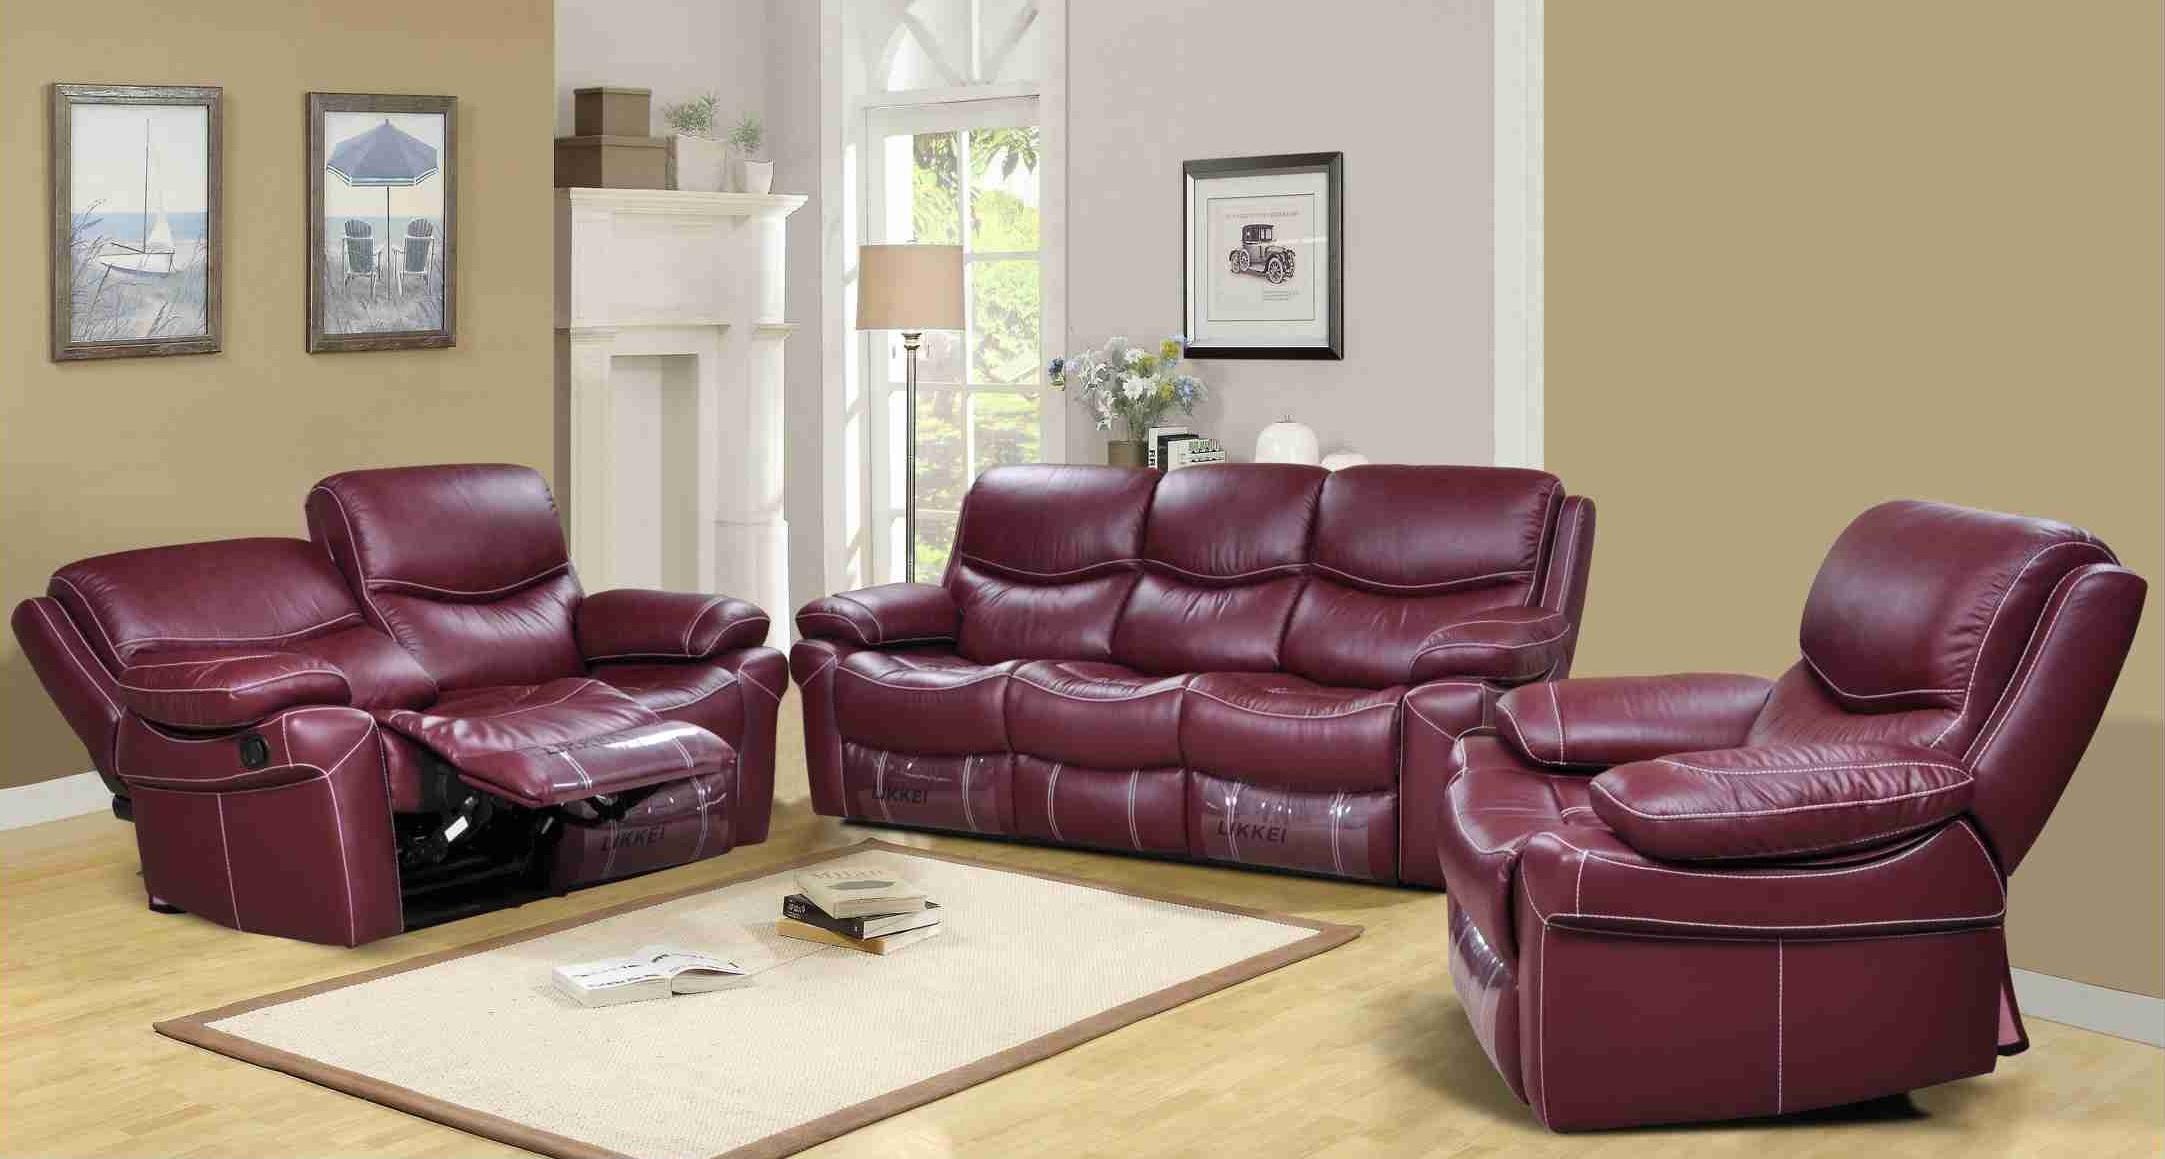 Langdon Burgundy Genuine Leather Power Reclining Sofa Set • Usa Inside Burgundy Leather Sofa Sets (Image 18 of 20)